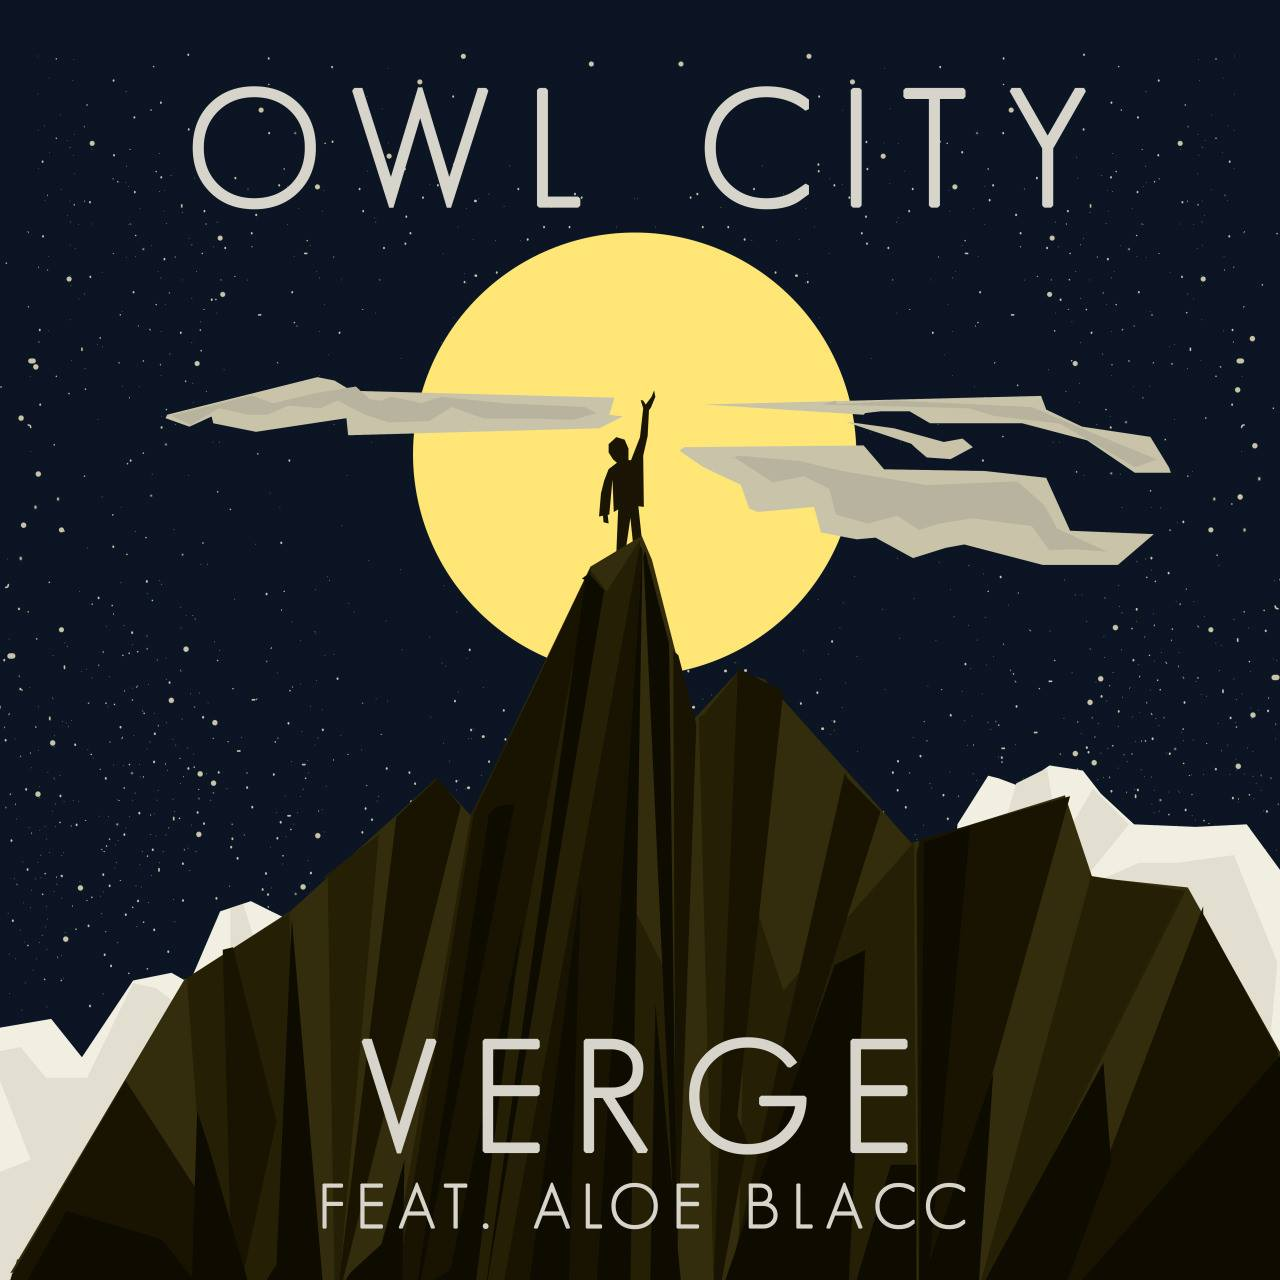 Owl City联手Aloe Blacc新单Verge!